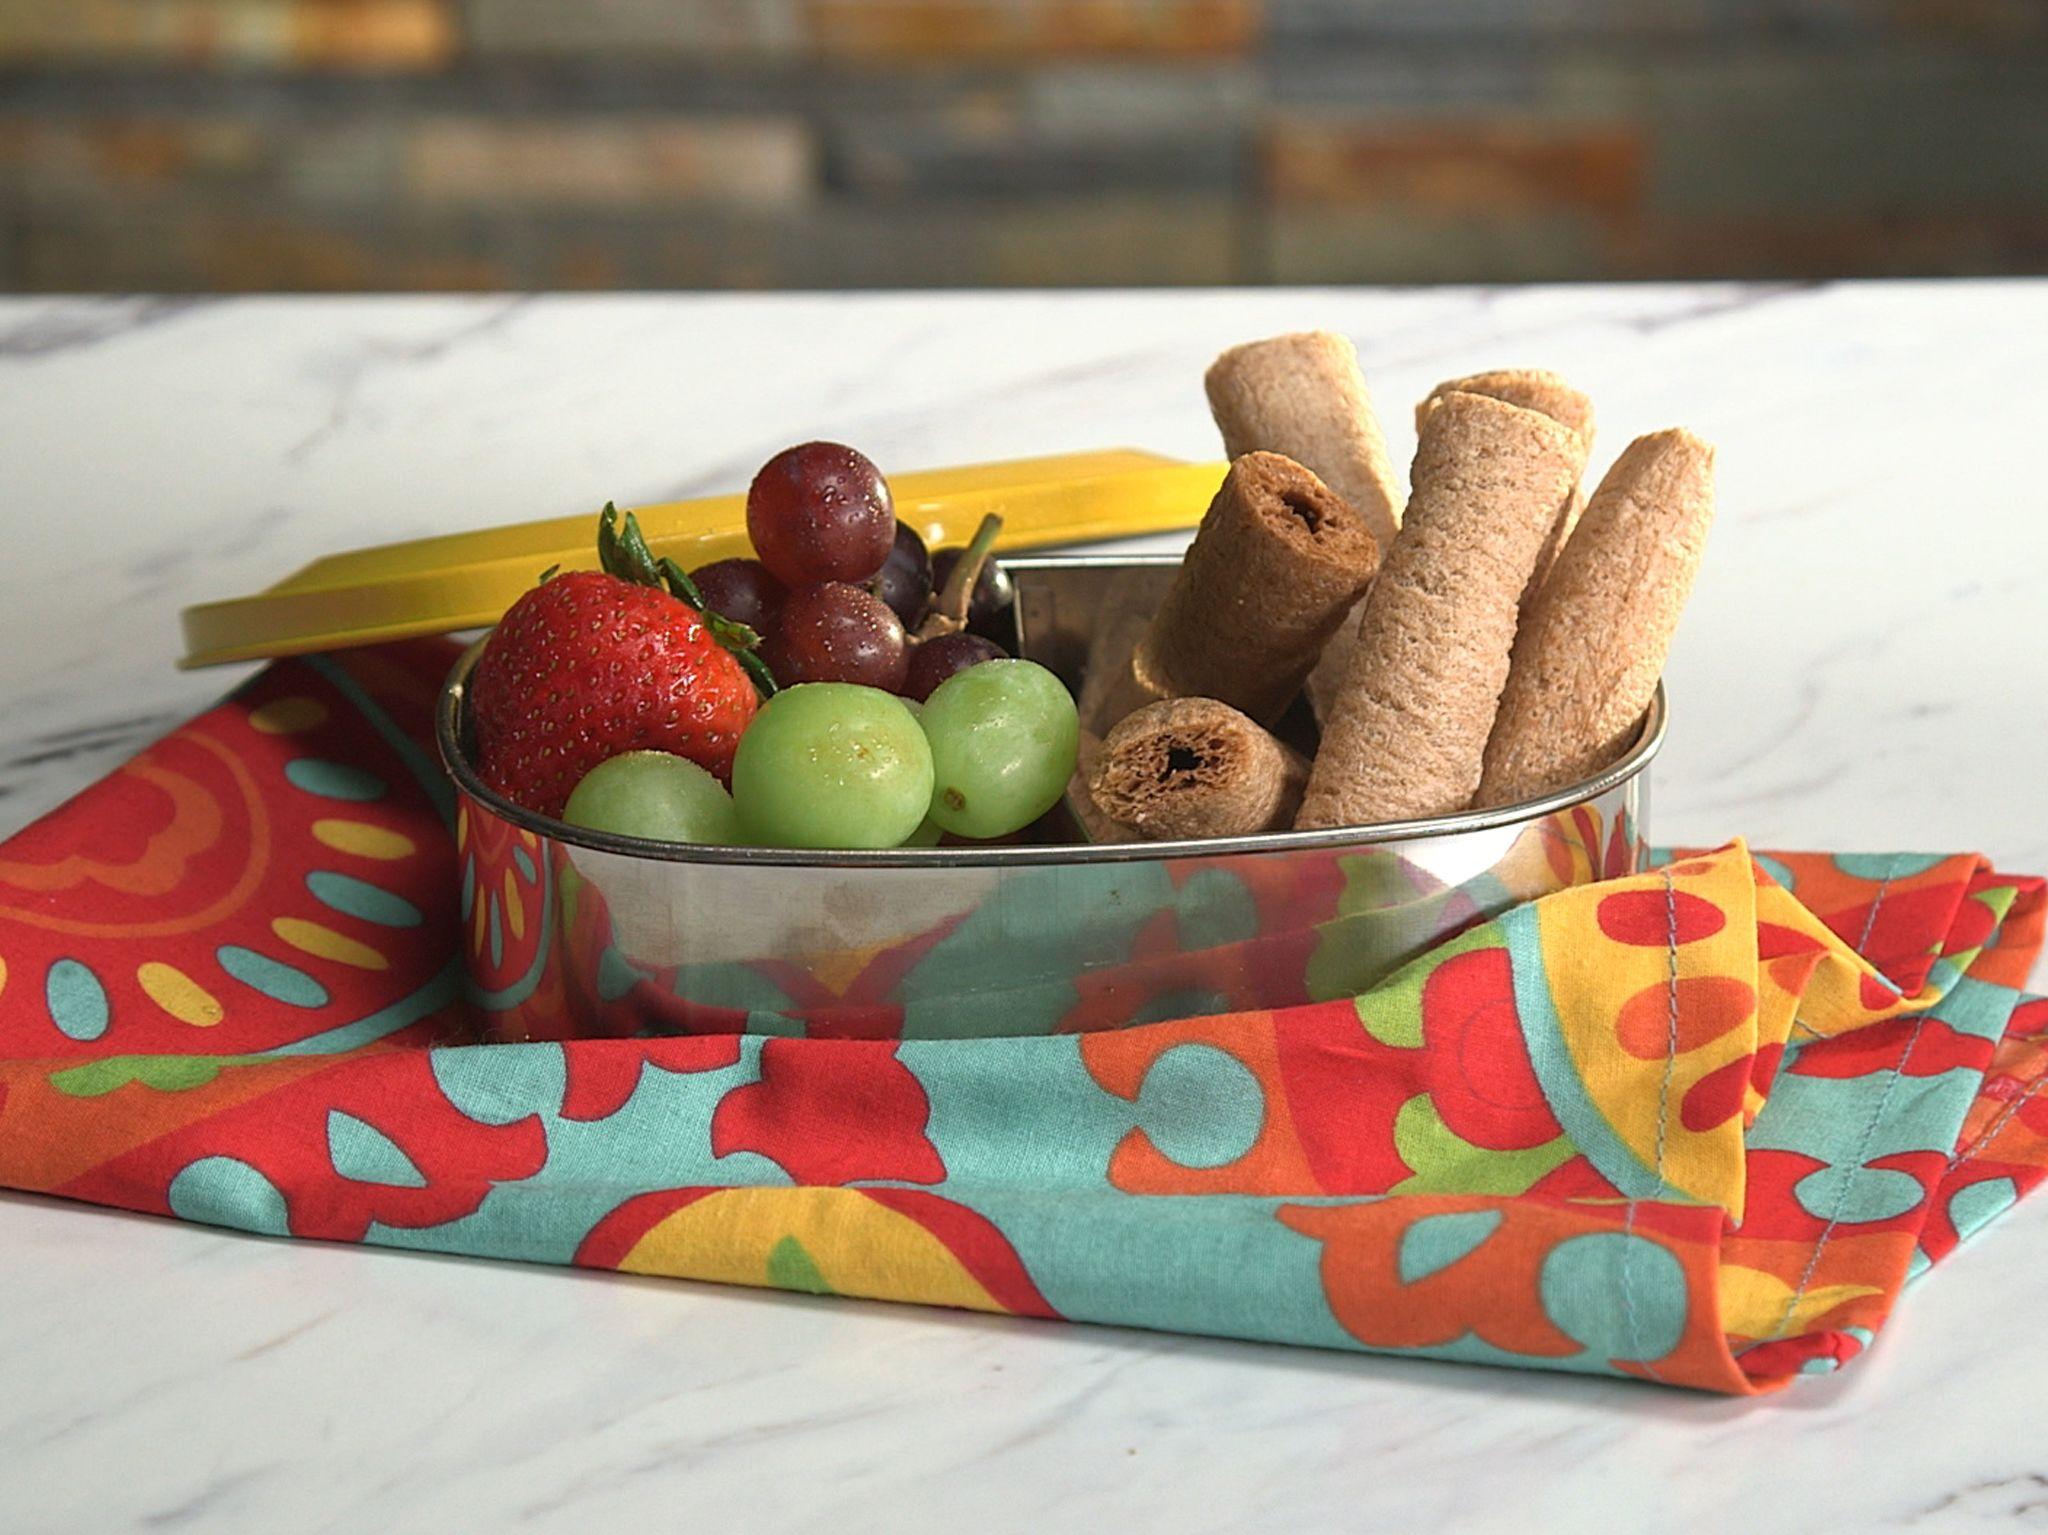 حلوى chocolate snack من Casy's Kwik. هذه الصورة من برنامج Food Factory. [Photo of the day - نوفمبر 2020]